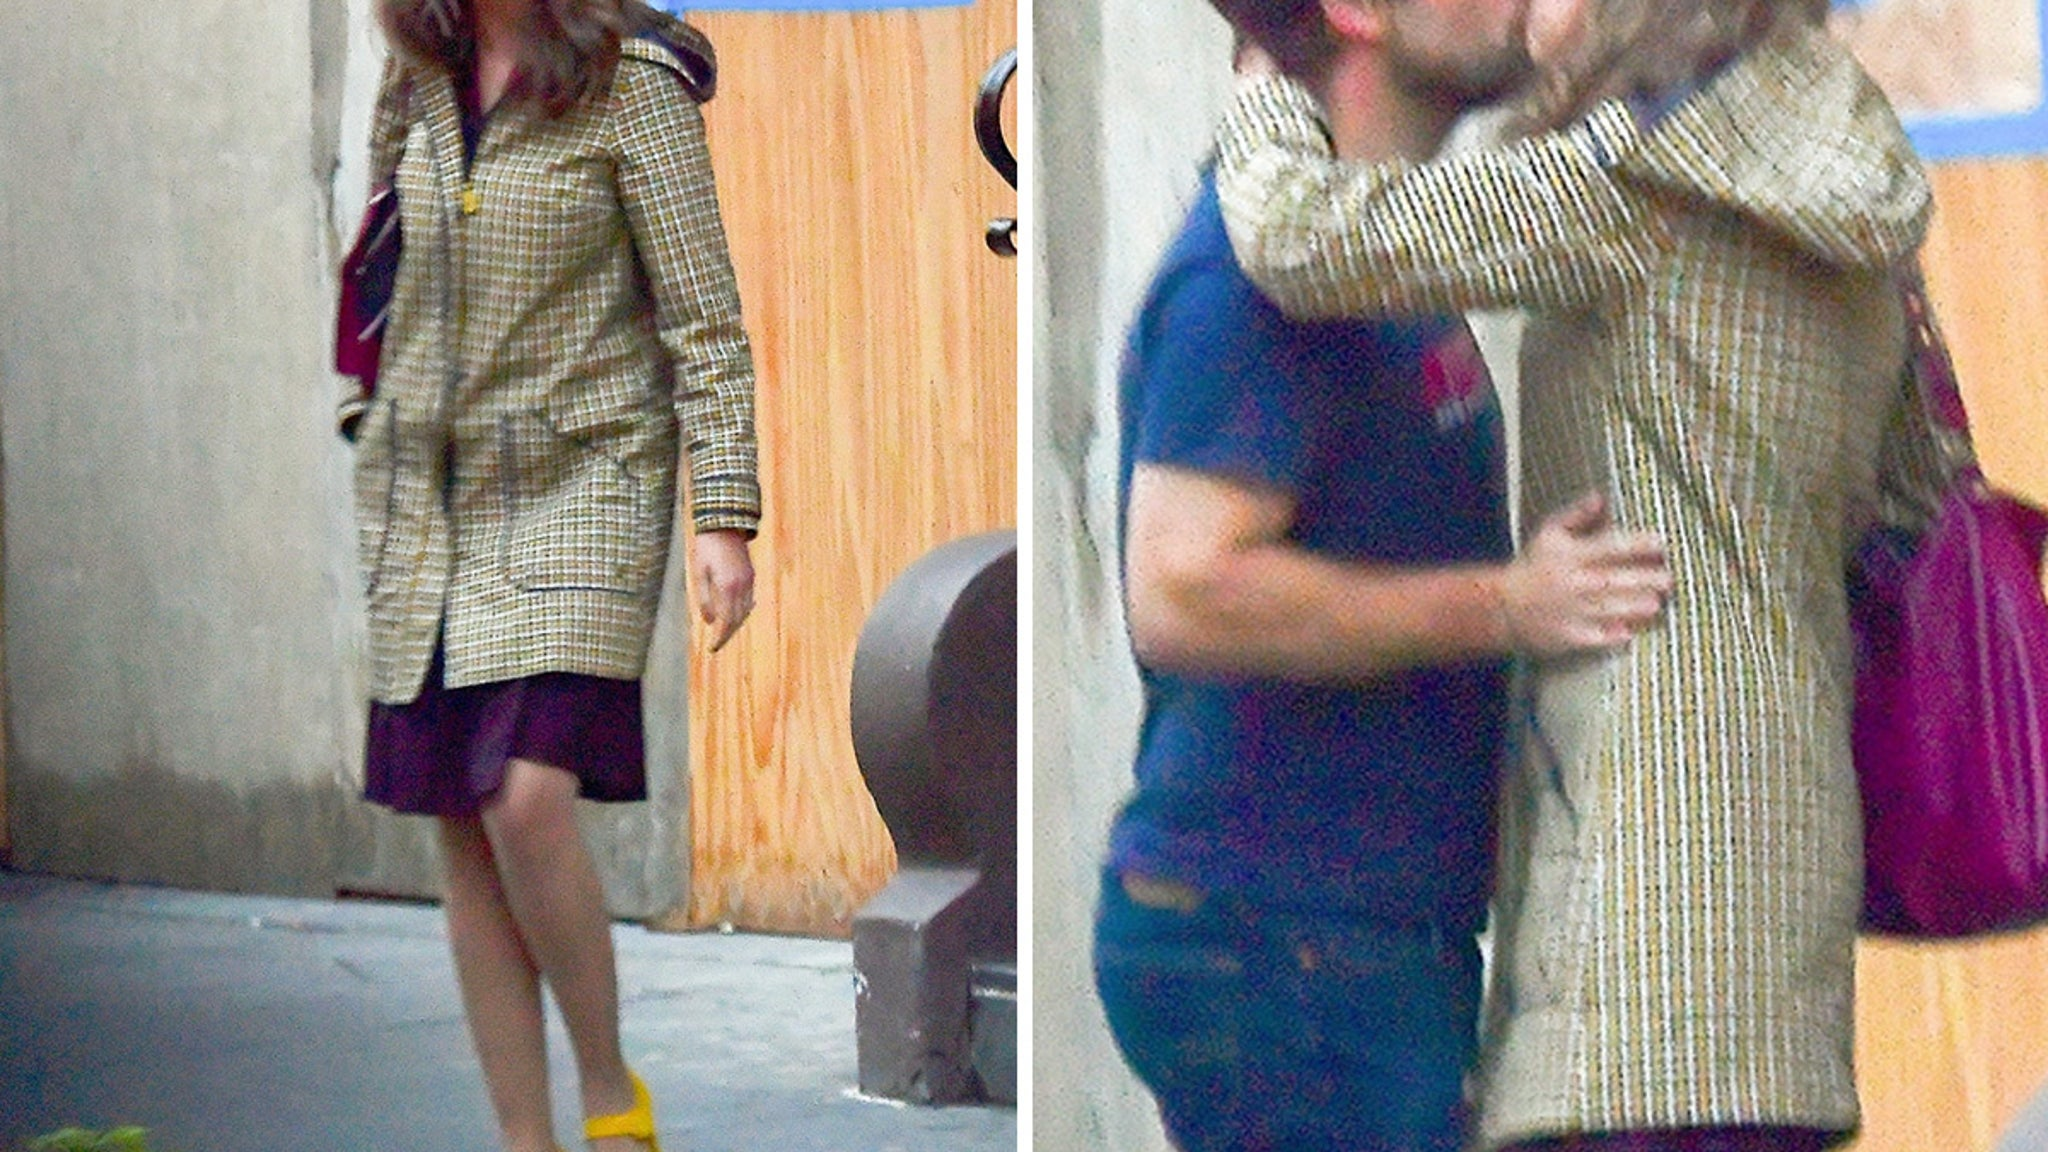 Matt Lauer Accuser Brooke Nevils Kisses BF, Rips 'Victim Shaming' Lauer